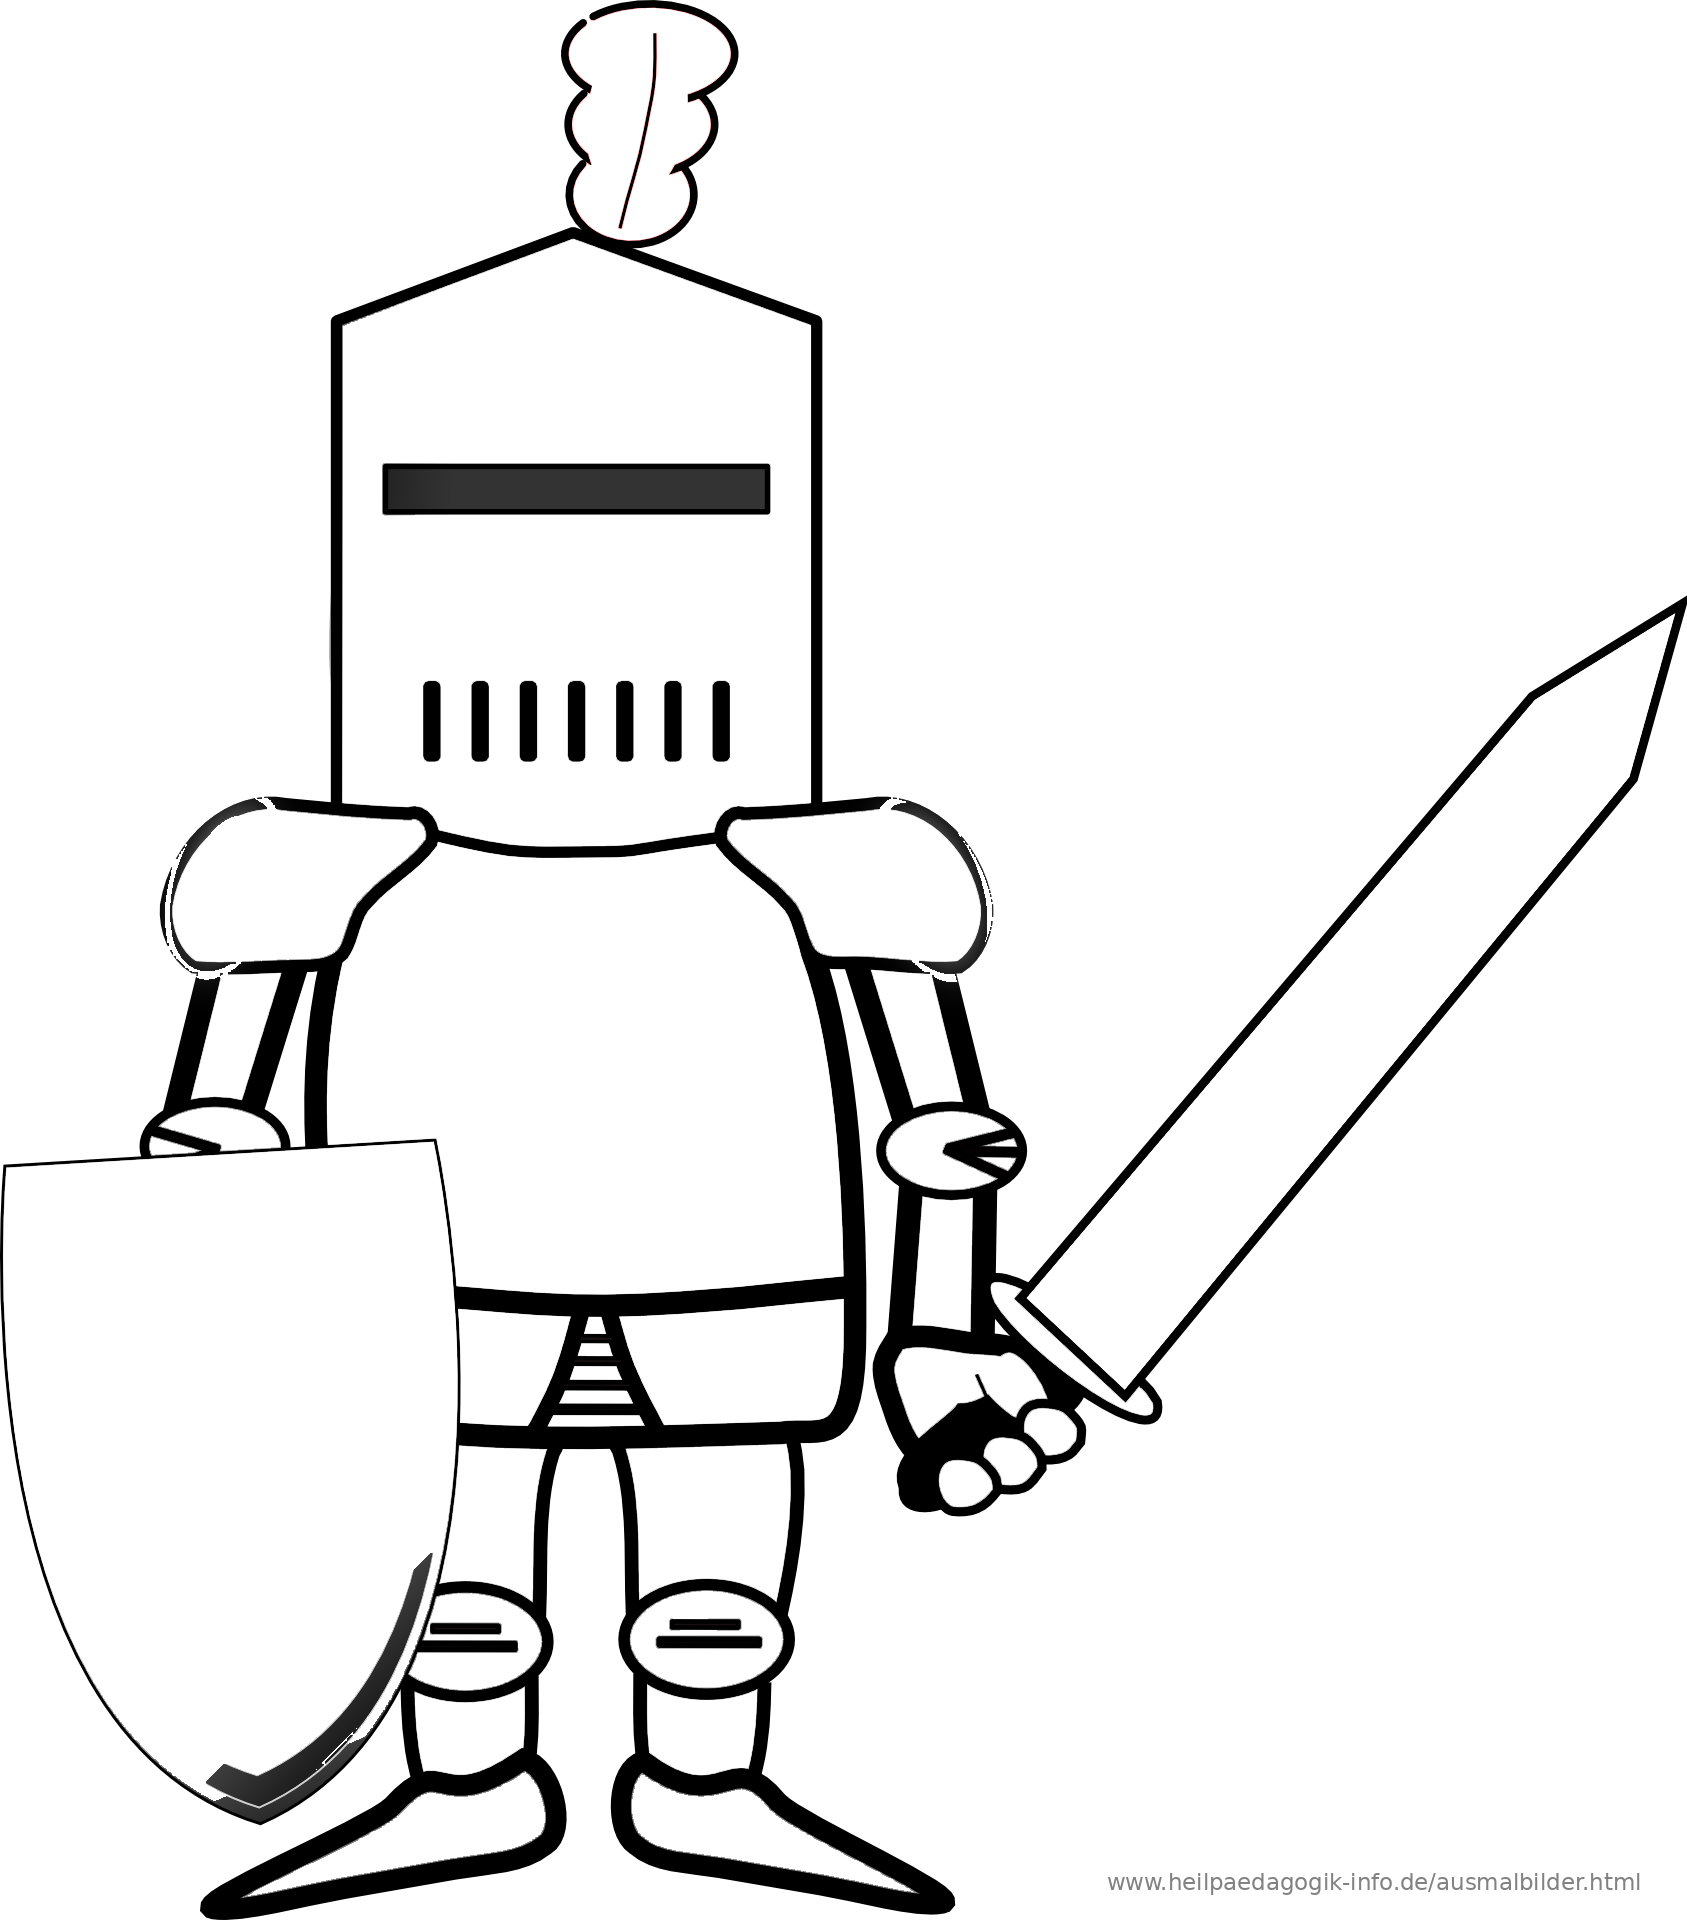 Ausmalbild Ritter Als PDF oder PNG anzeigen